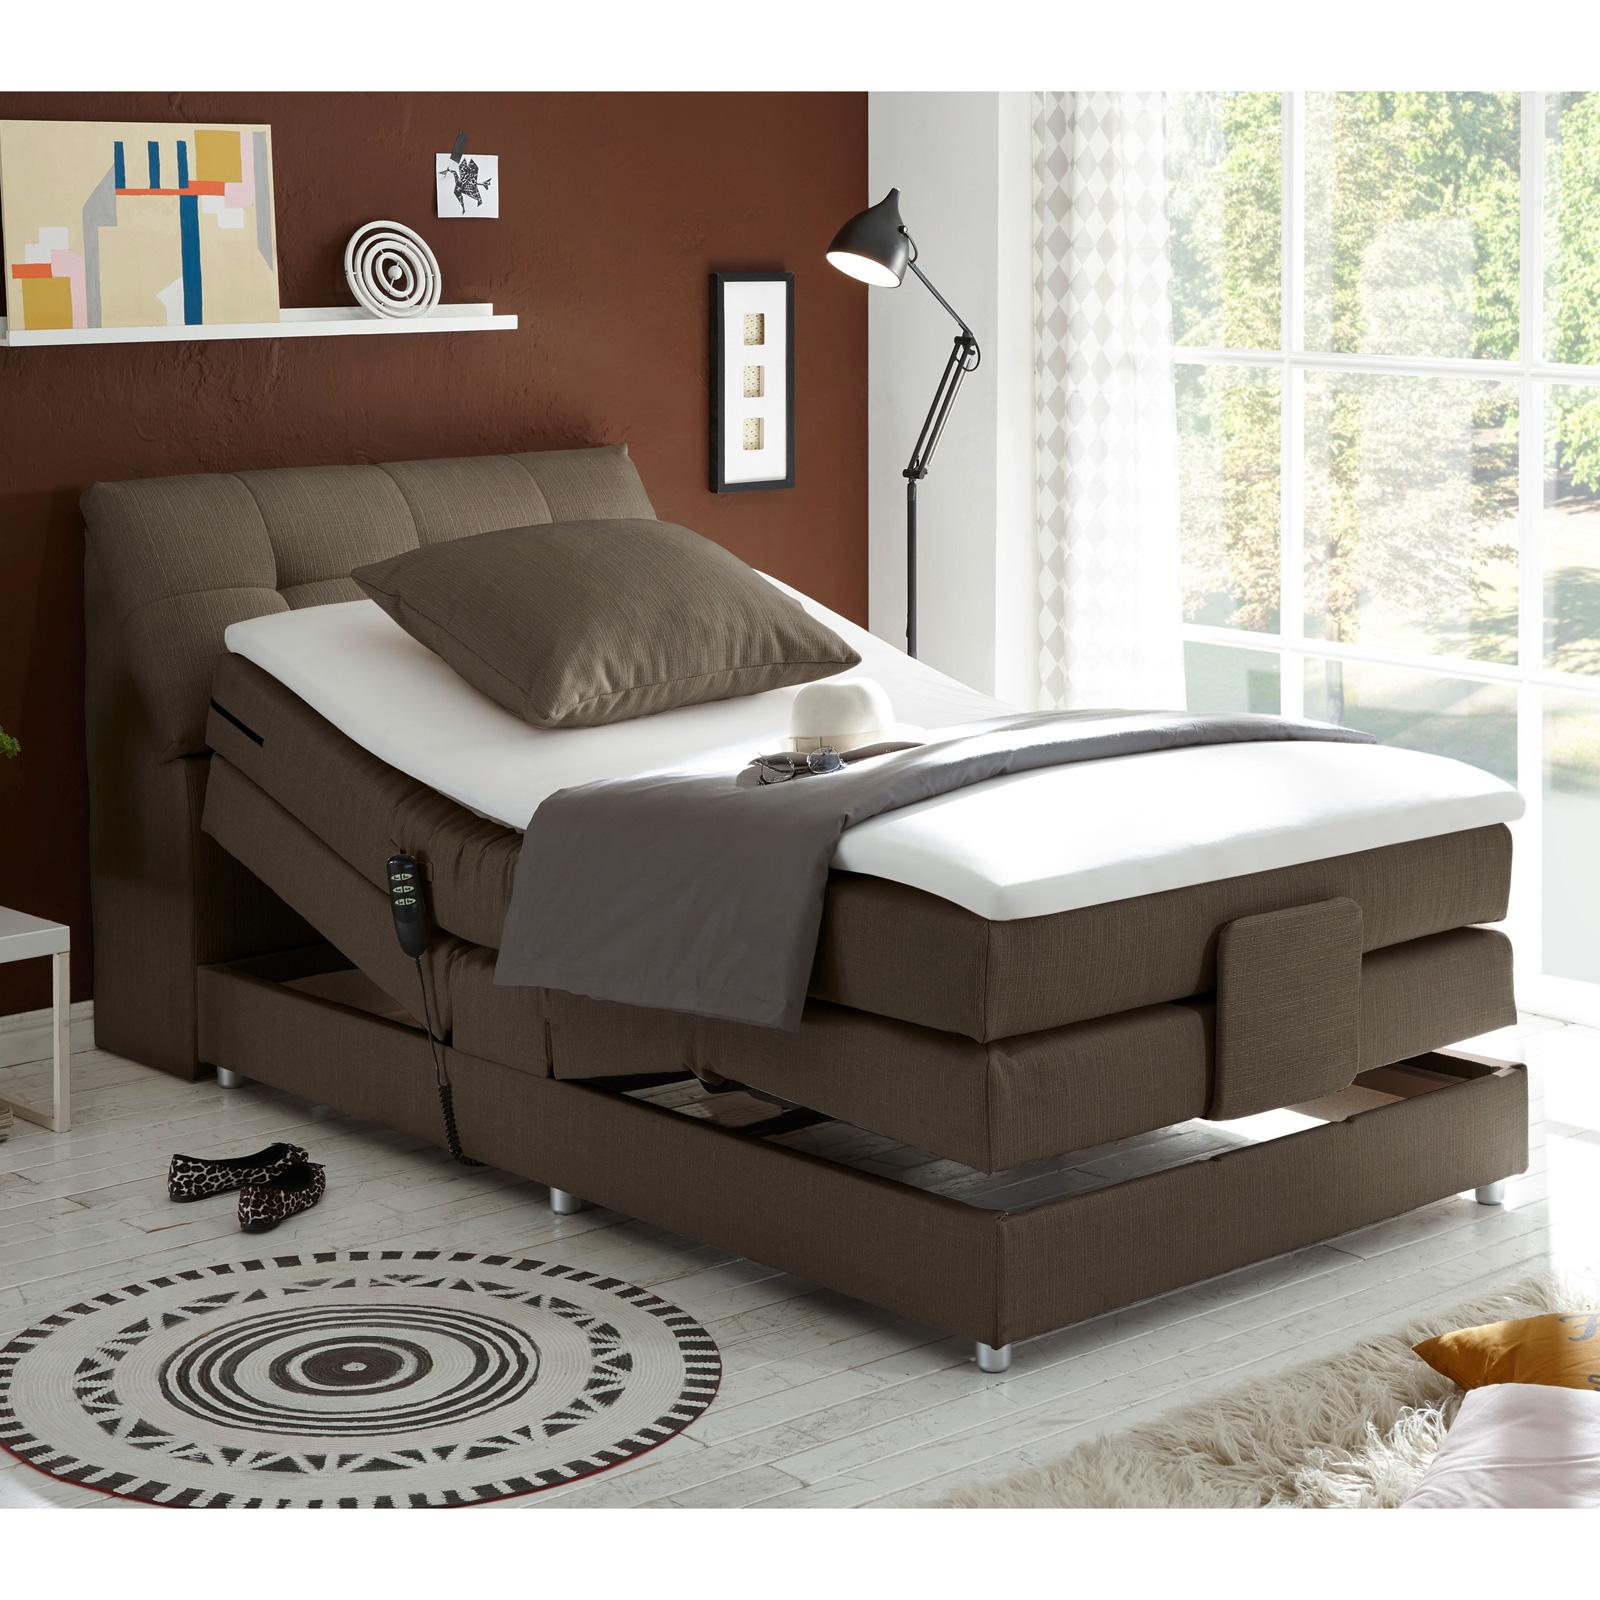 boxspringbett concort bett stoff inkl motor und topper farbauswahl 120x200 cm ebay. Black Bedroom Furniture Sets. Home Design Ideas